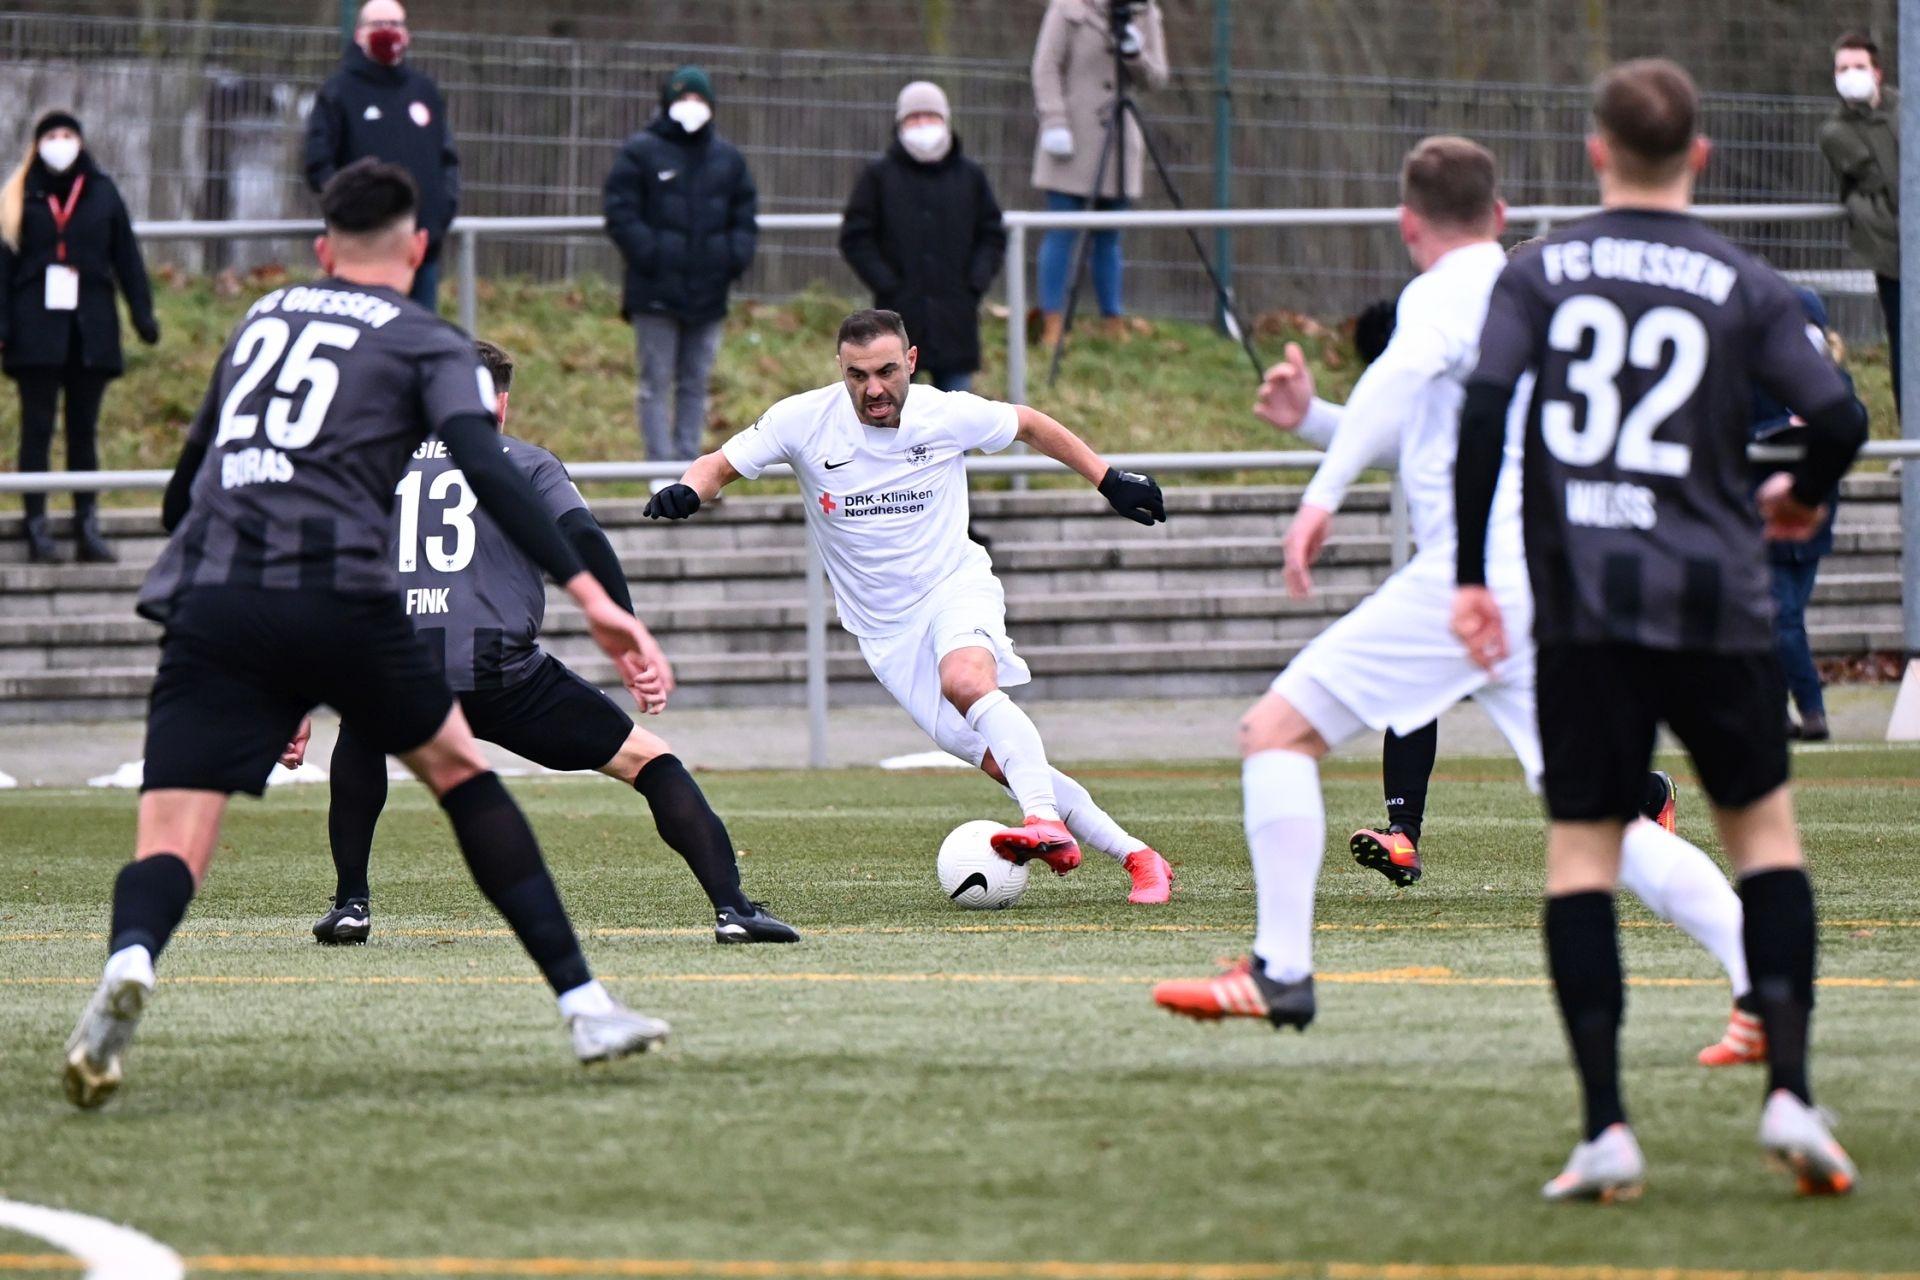 Regionalliga Südwest 2020/21, KSVHessen Kassel, FC Gießen, Endstand 1:1, Mahir Saglik